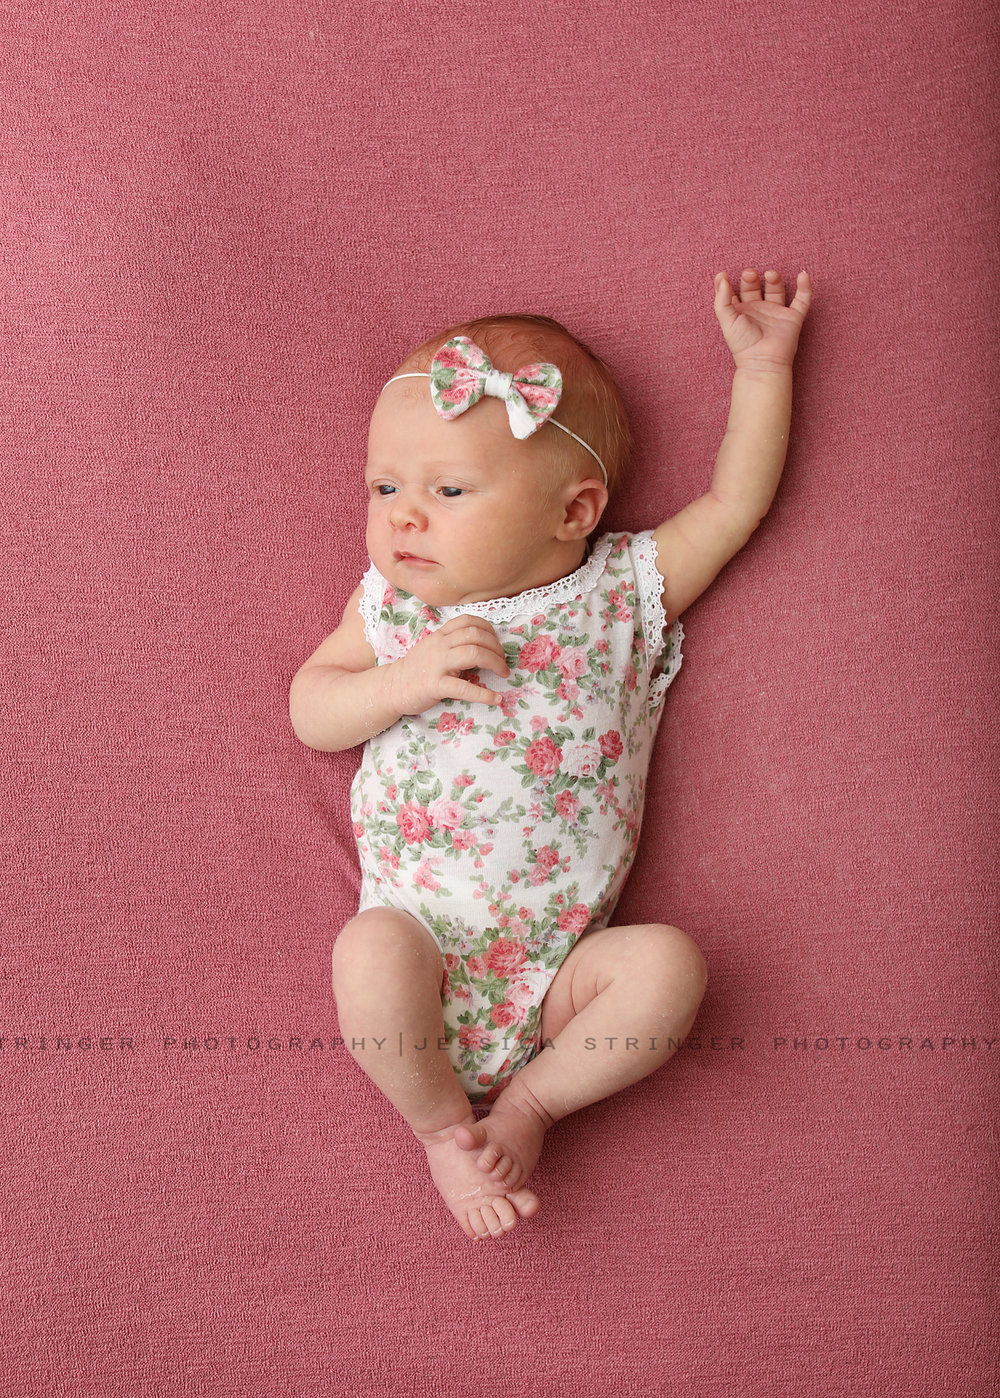 Sweet baby girl <3 rochester ny newborn photography